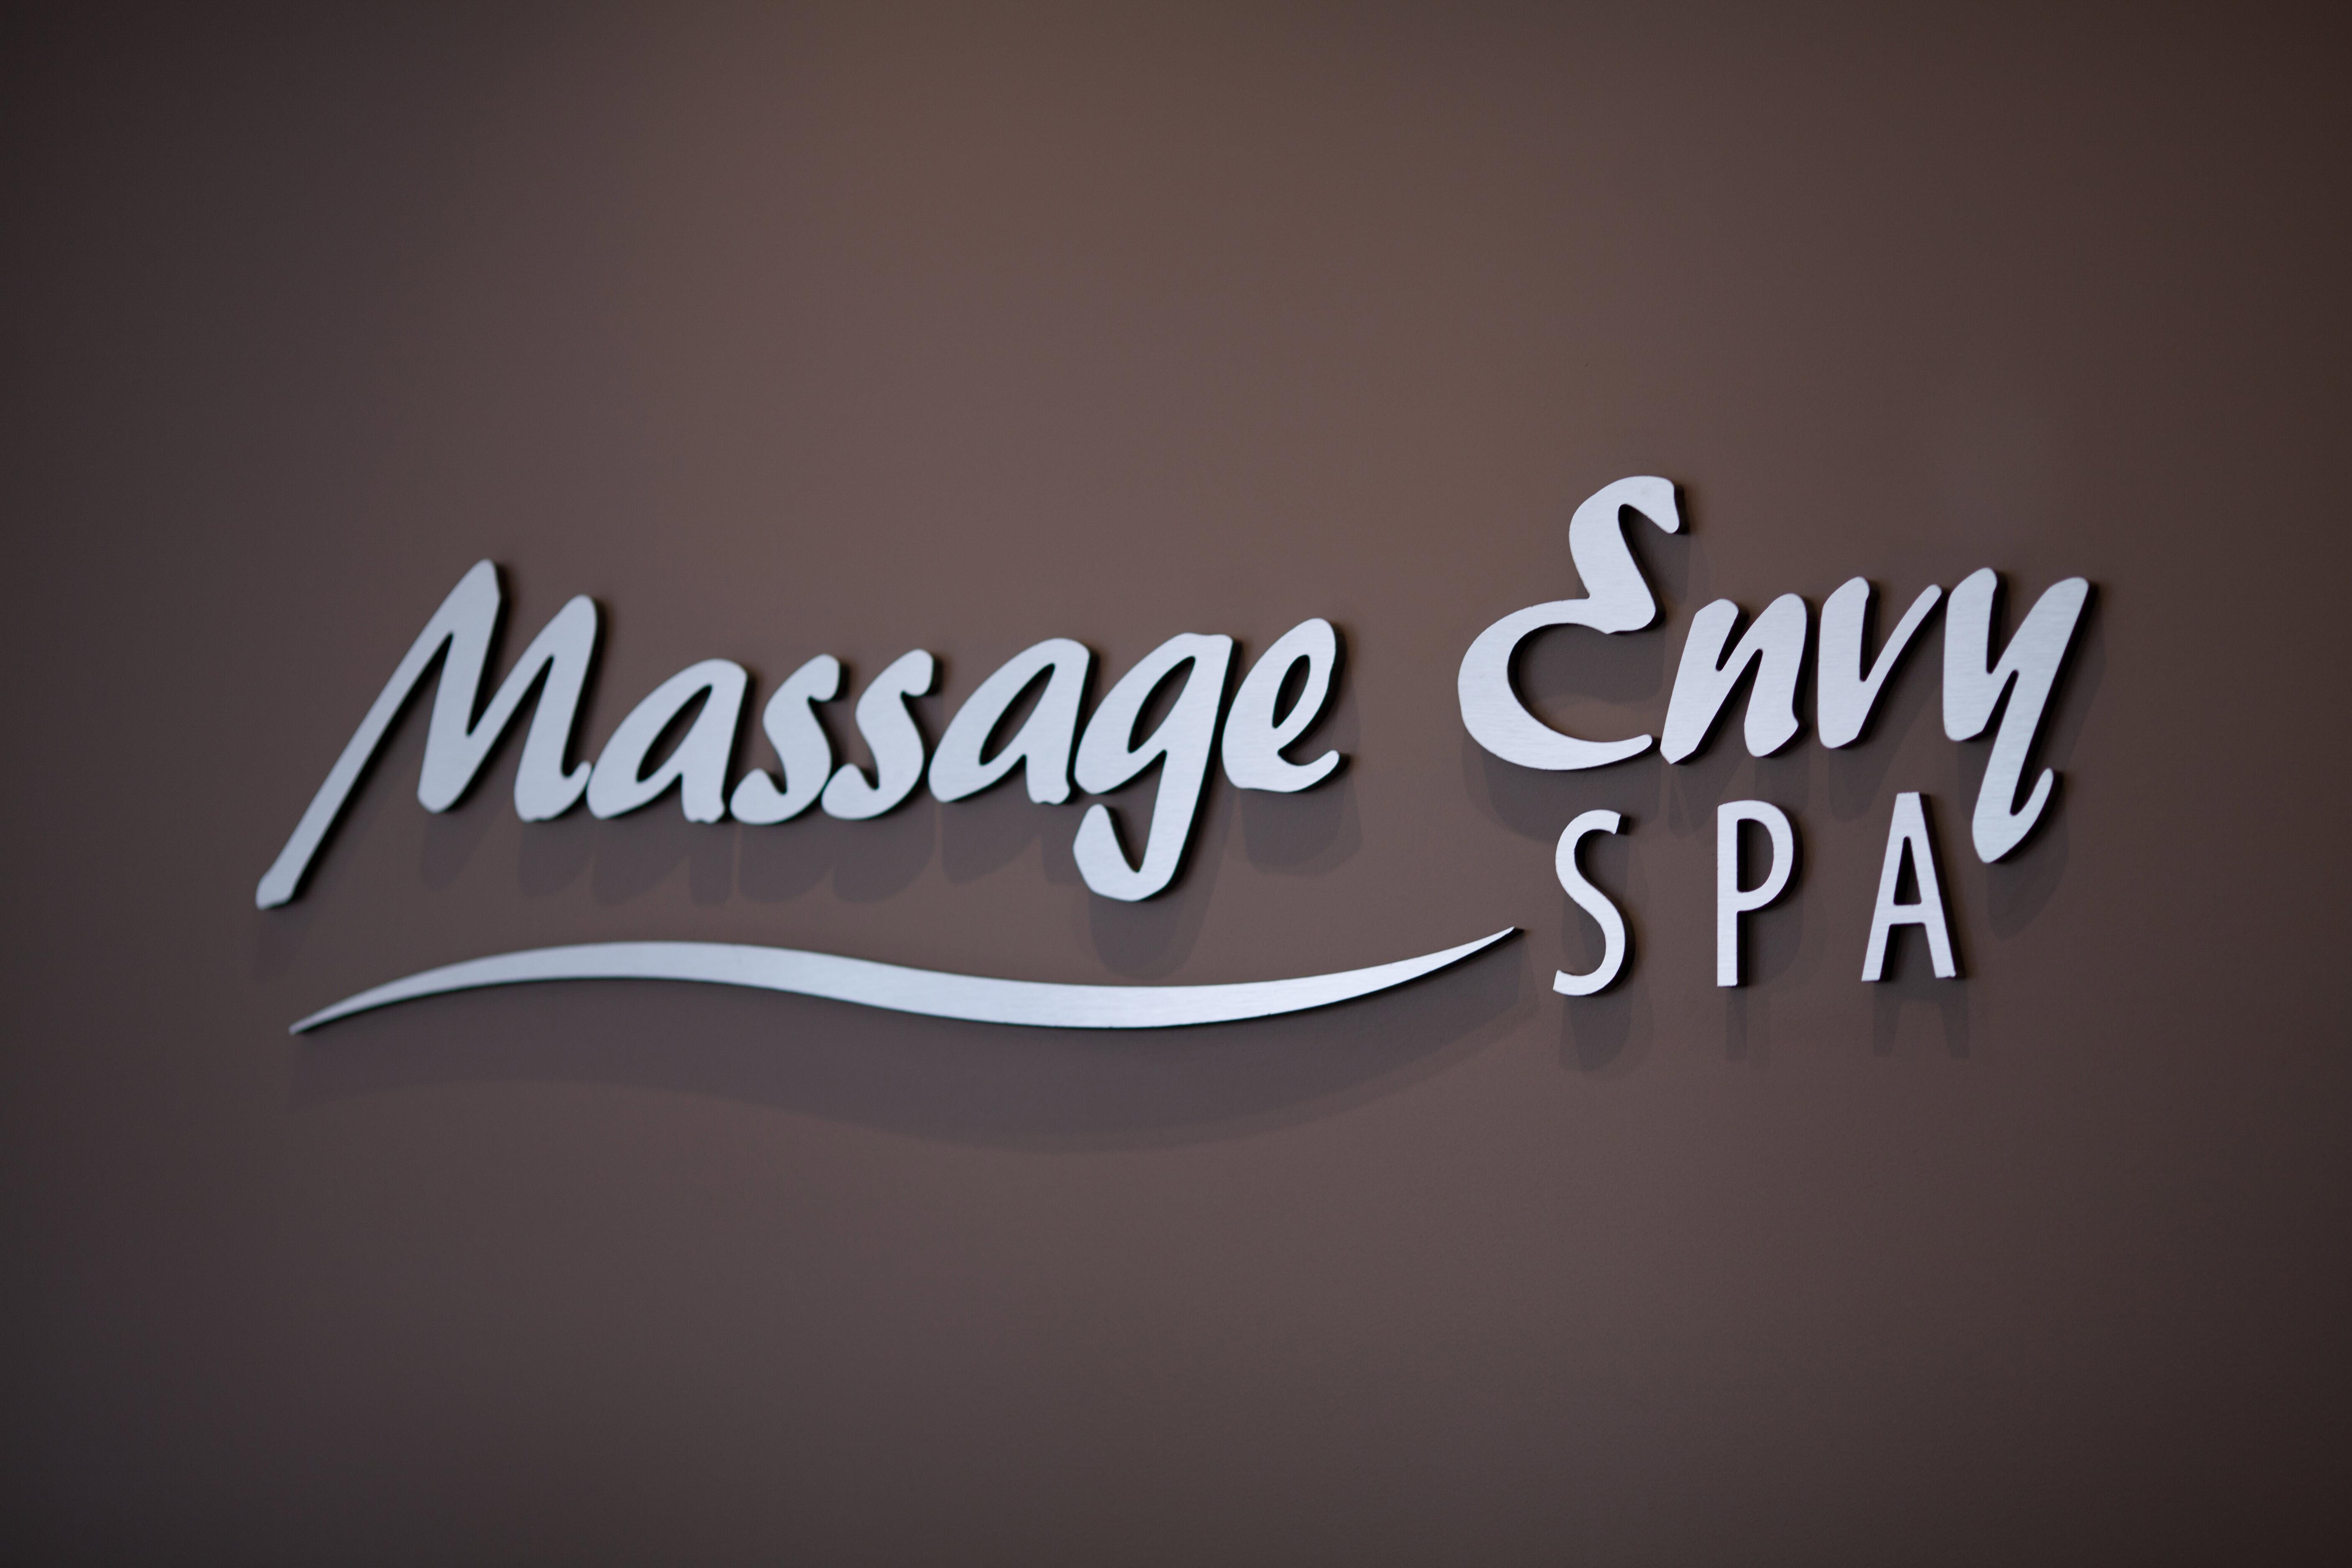 Massage Envy Spa - Dedham